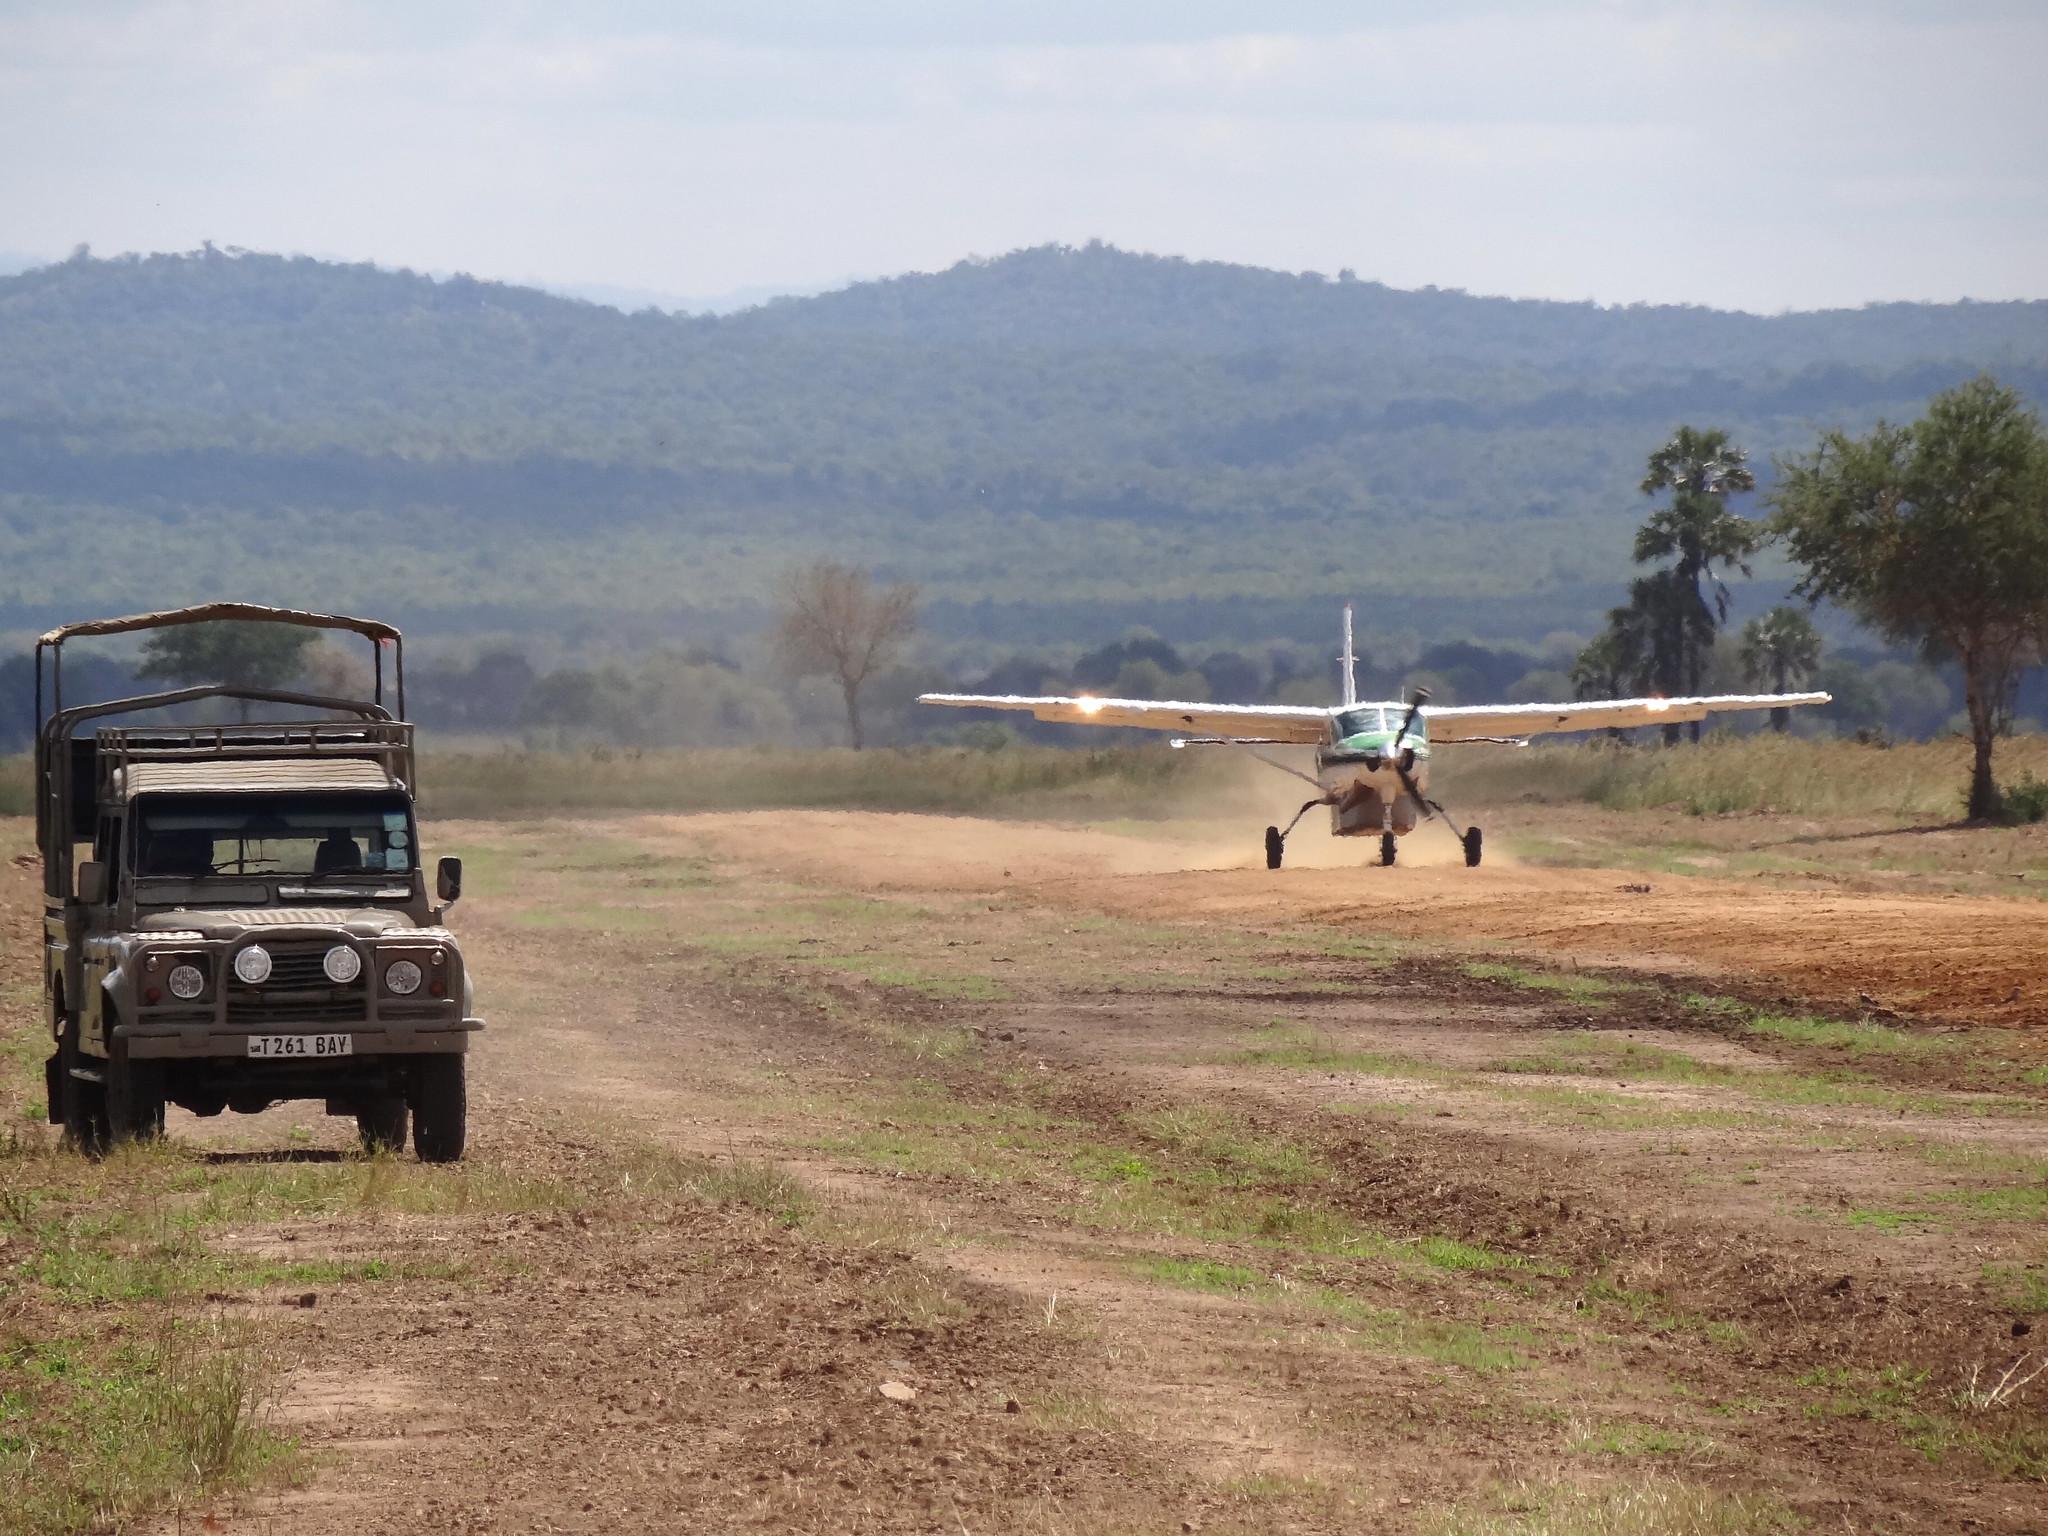 A Cessna landing alongside a Land Rover in Mikumi National Park, Tanzania. Photograph by Adam Jones, 2013. CC BY-SA 2.0.